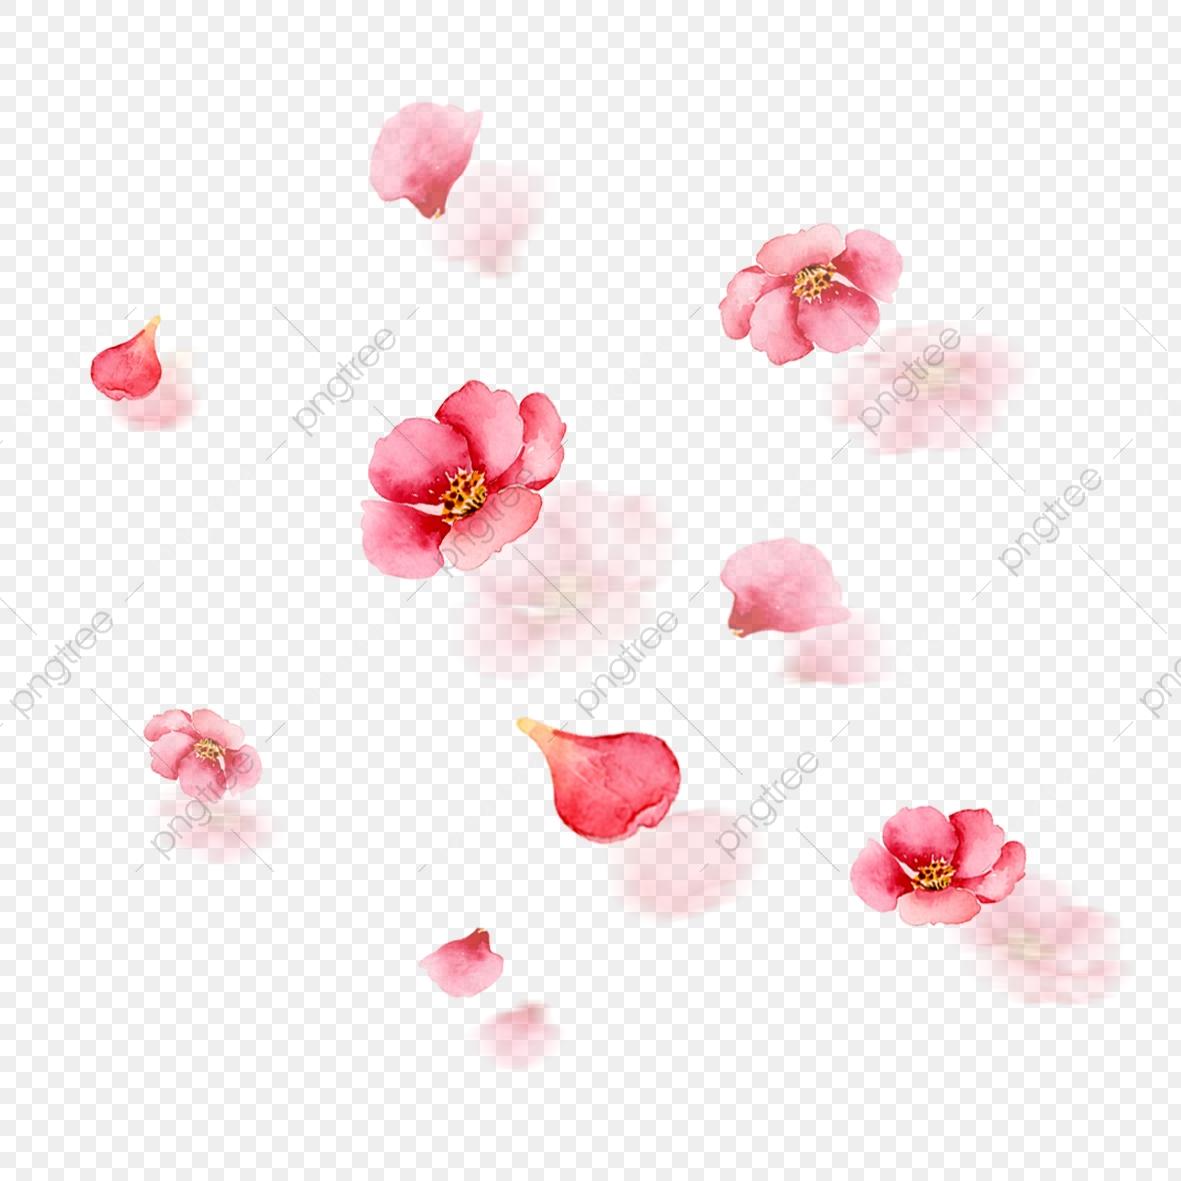 Fart clipart flower. Plant petals floating atmosphere